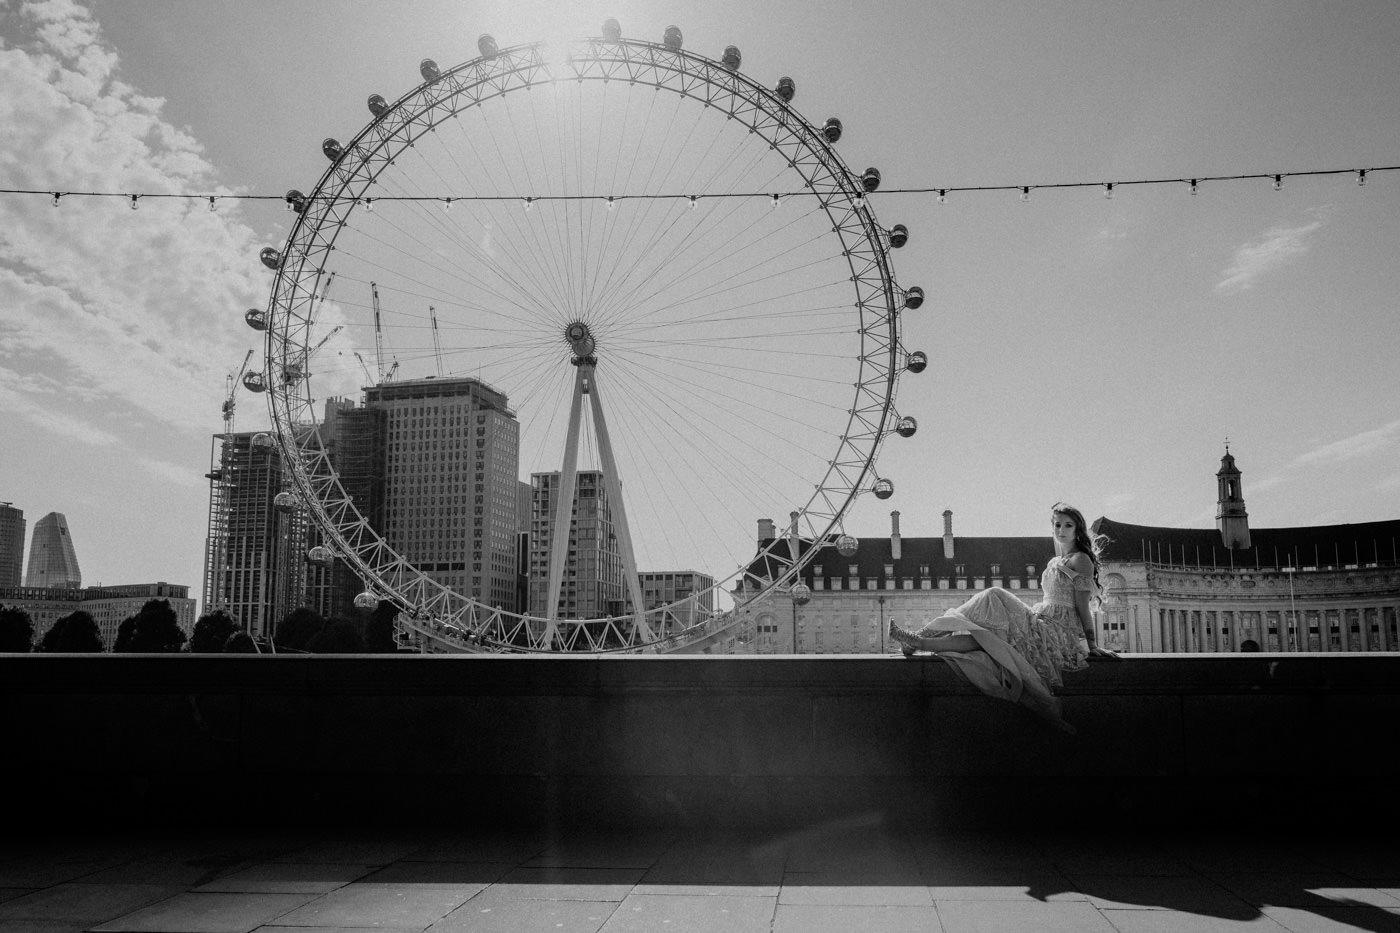 MAGDA & TOMEK - LONDON ASYLUM CHAPEL & SEVEN SISTERS CLIFFS 15